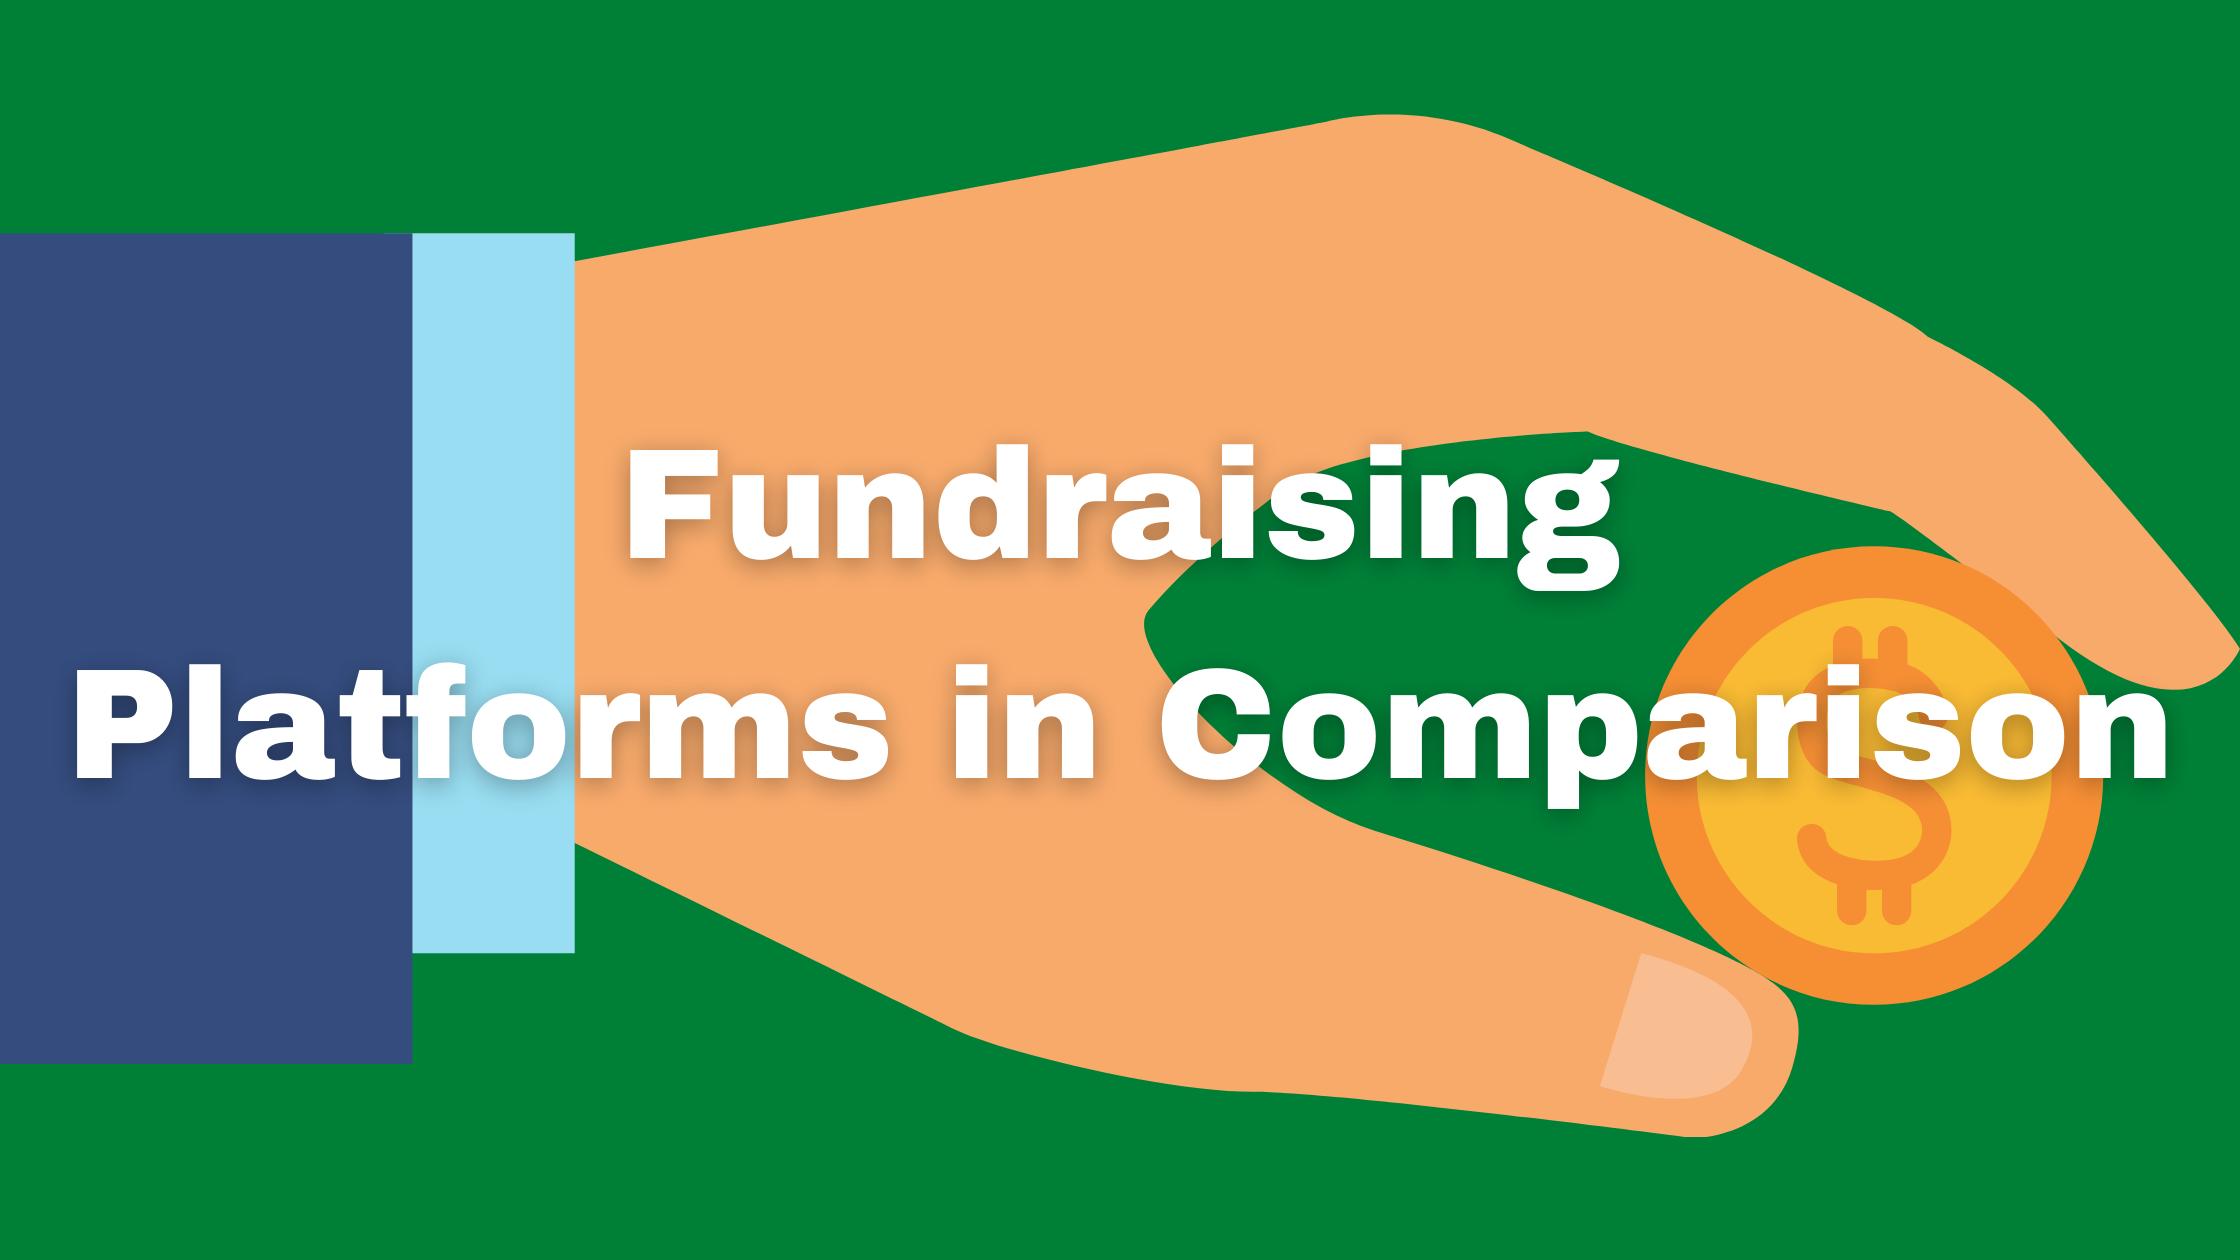 fundraising platforms in comparison